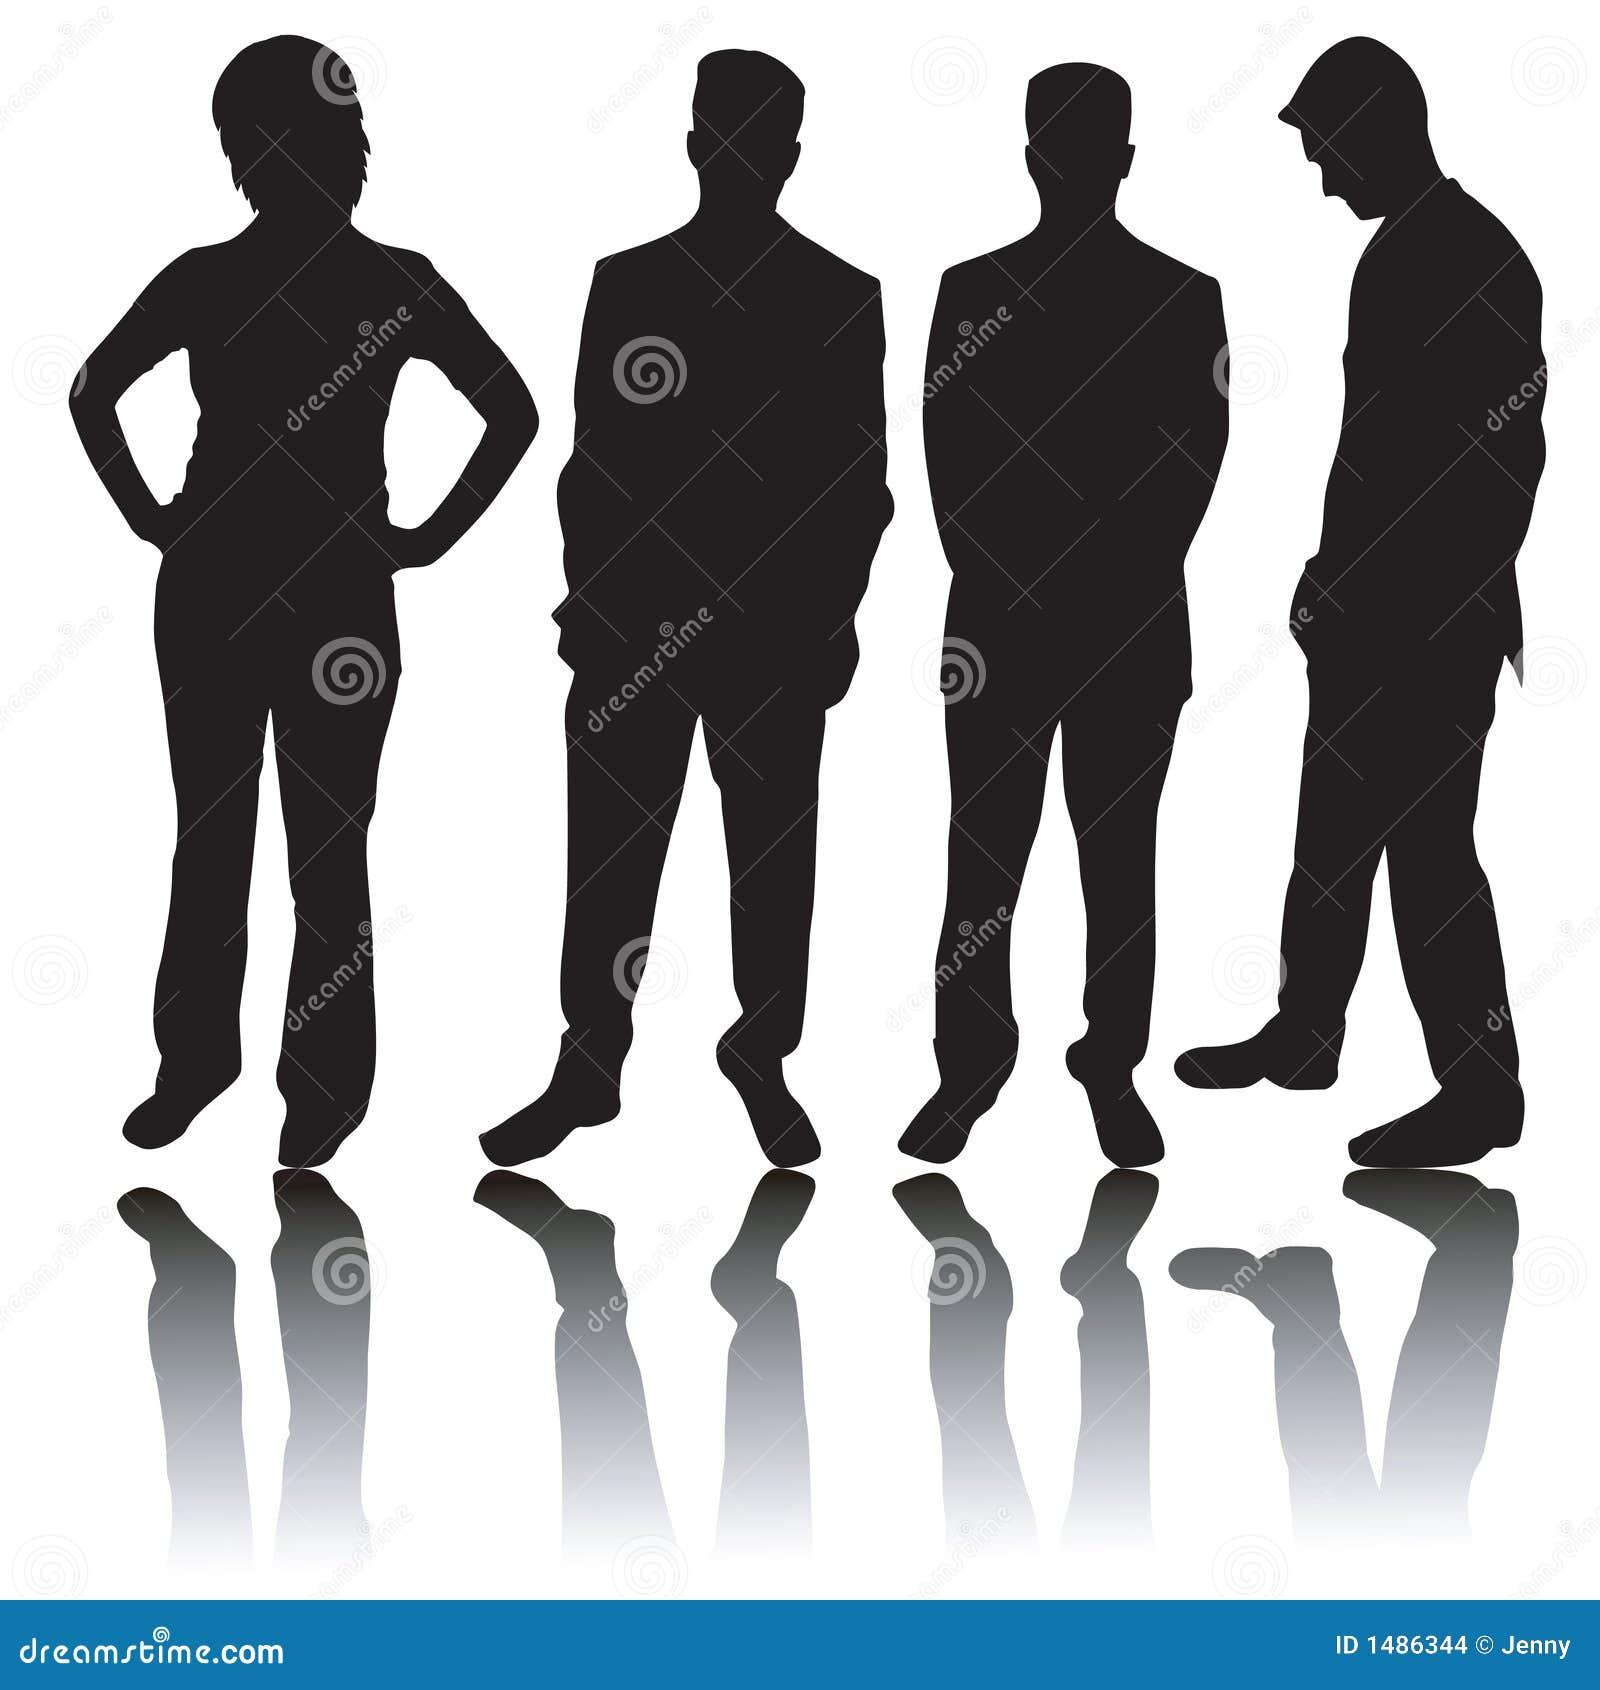 Business Person Silhouette